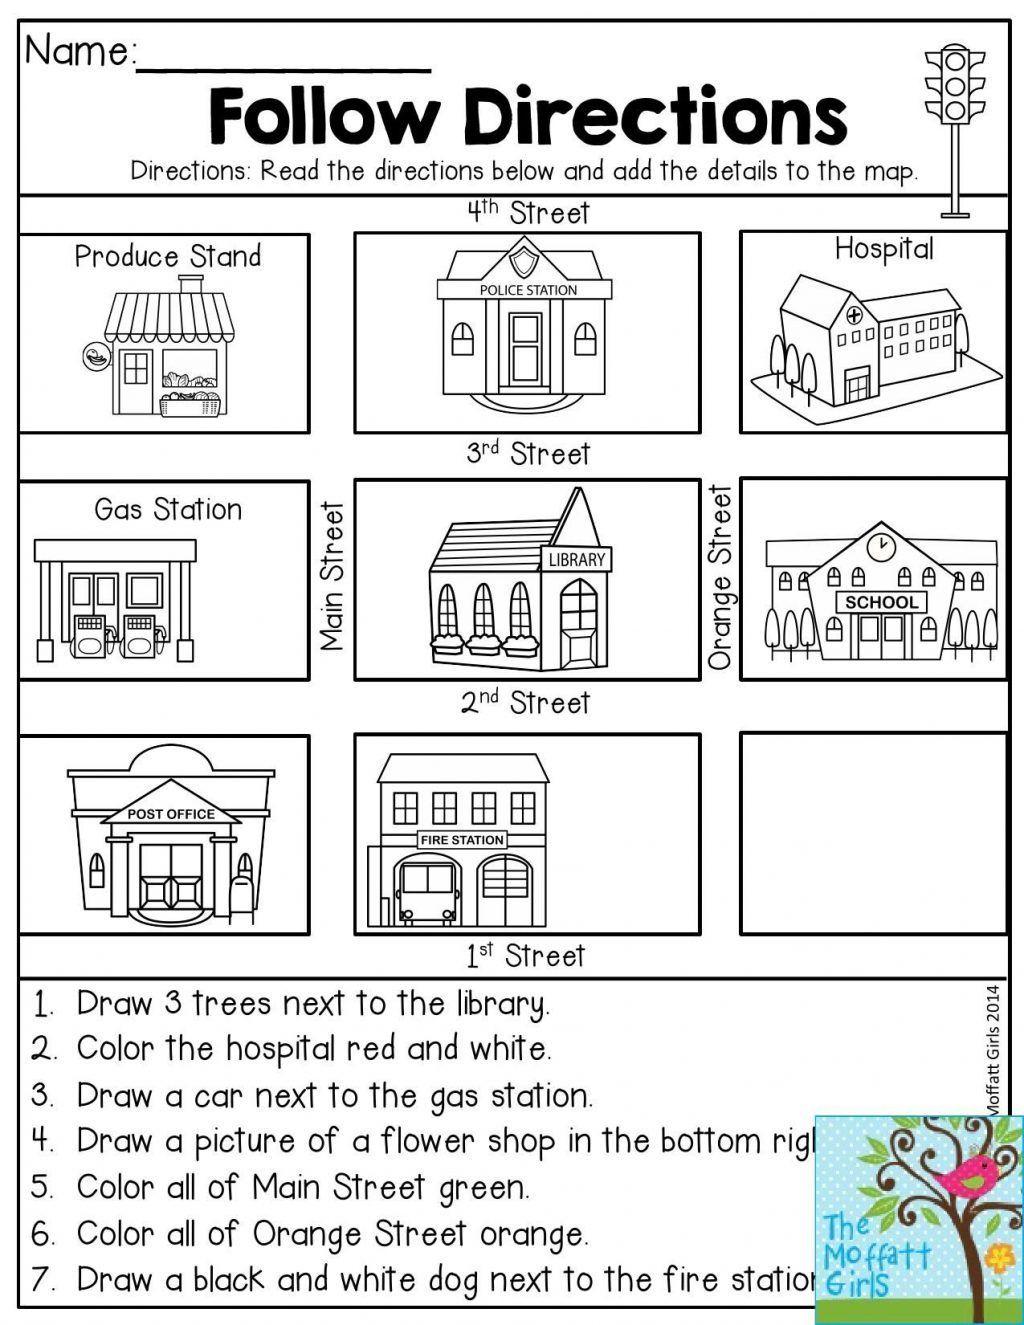 Free Map Skills Worksheets Math Worksheets Free Printable Following - Printable Map Skills Worksheets